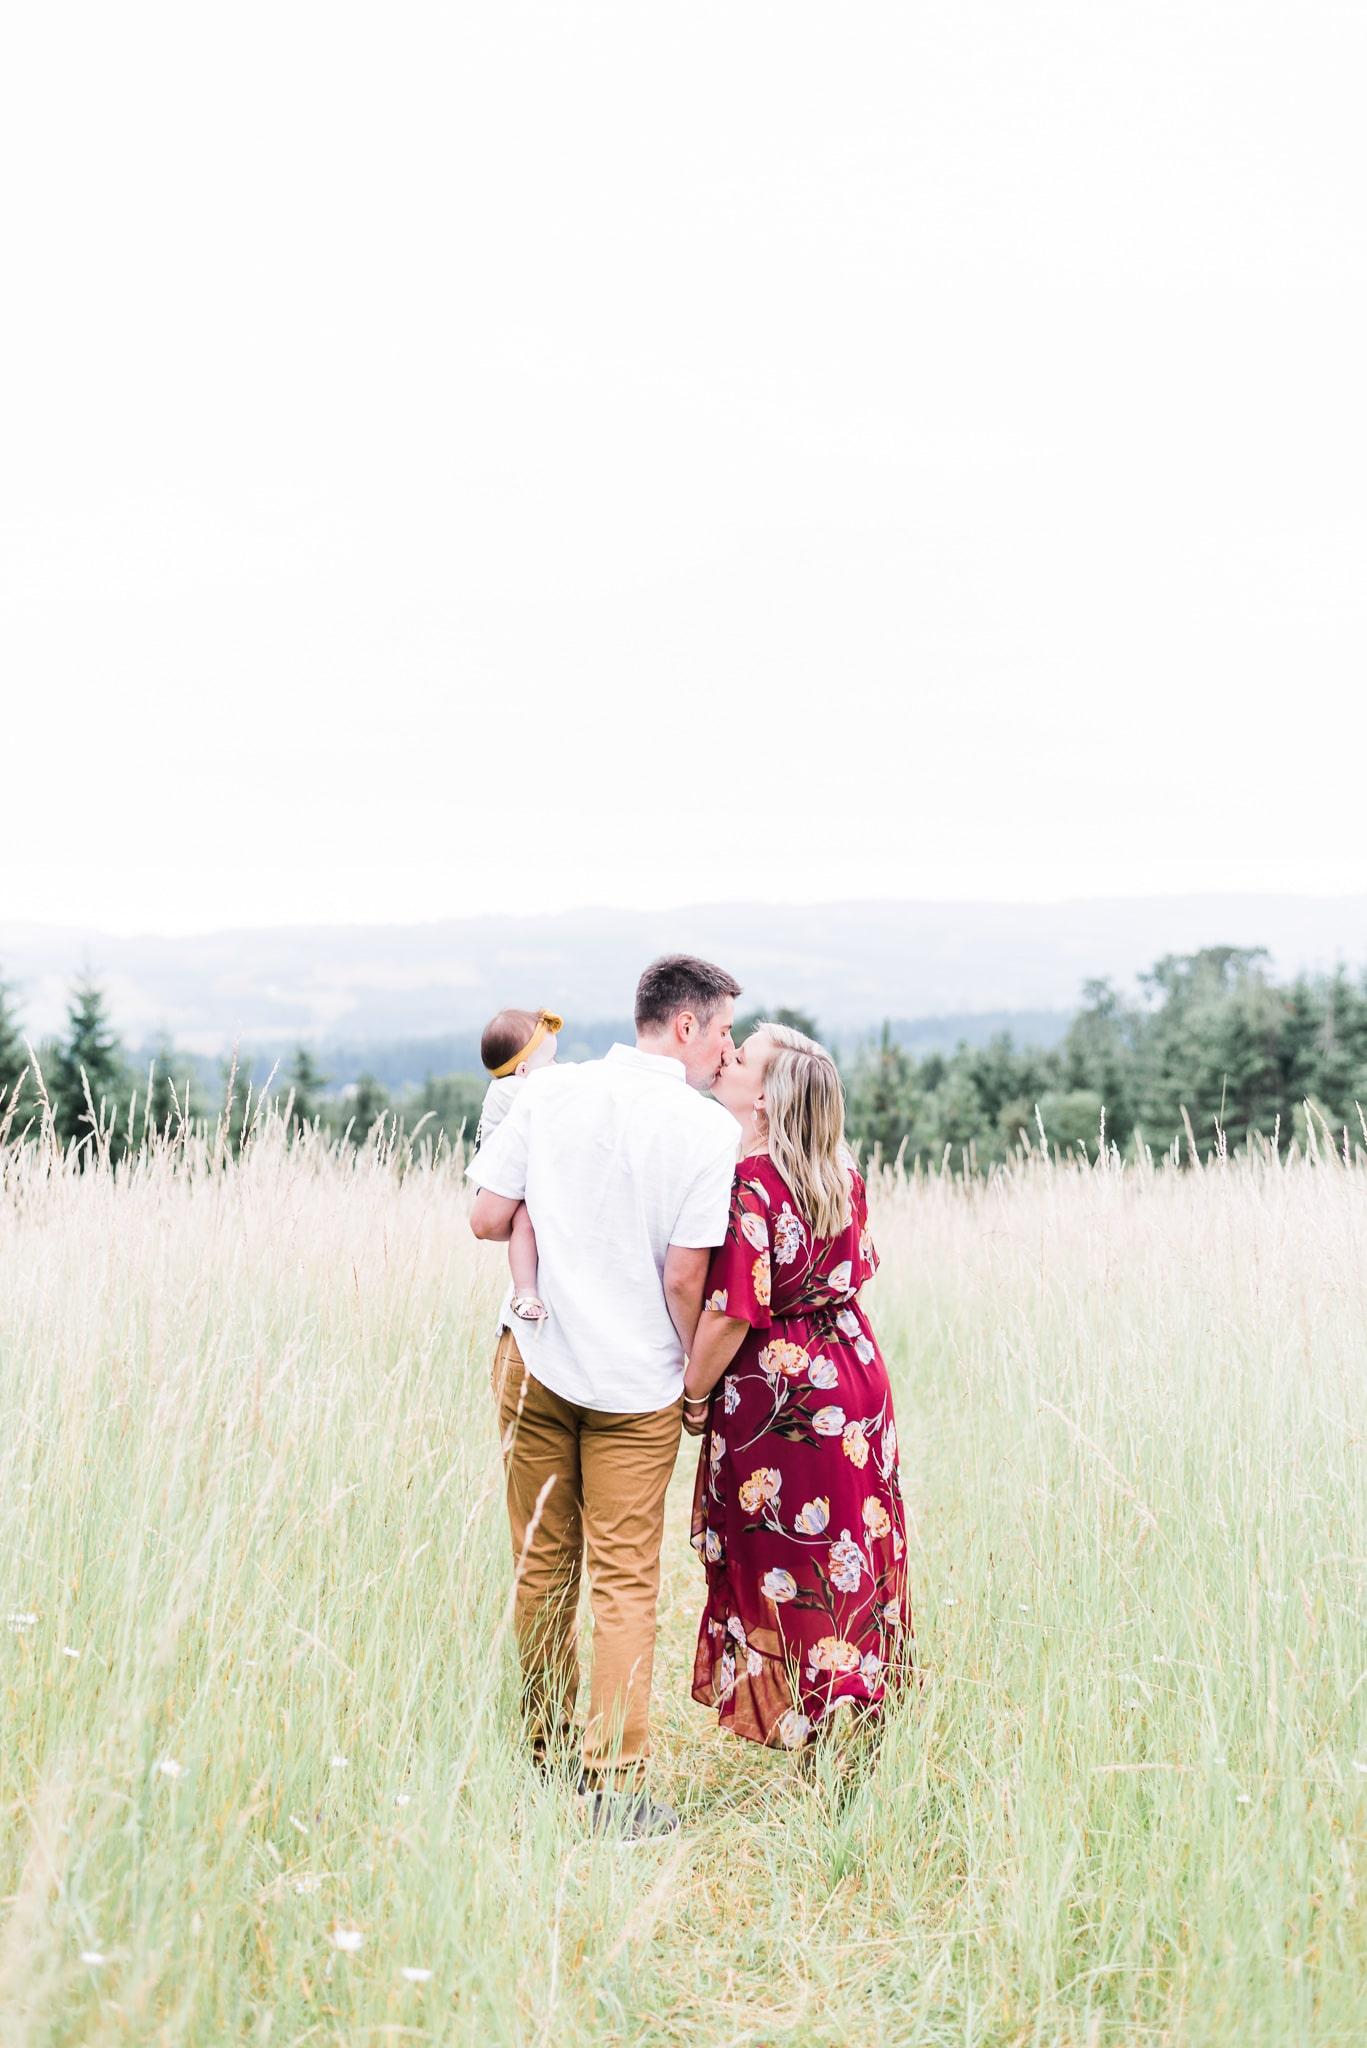 Portland family photography one year photoshoot